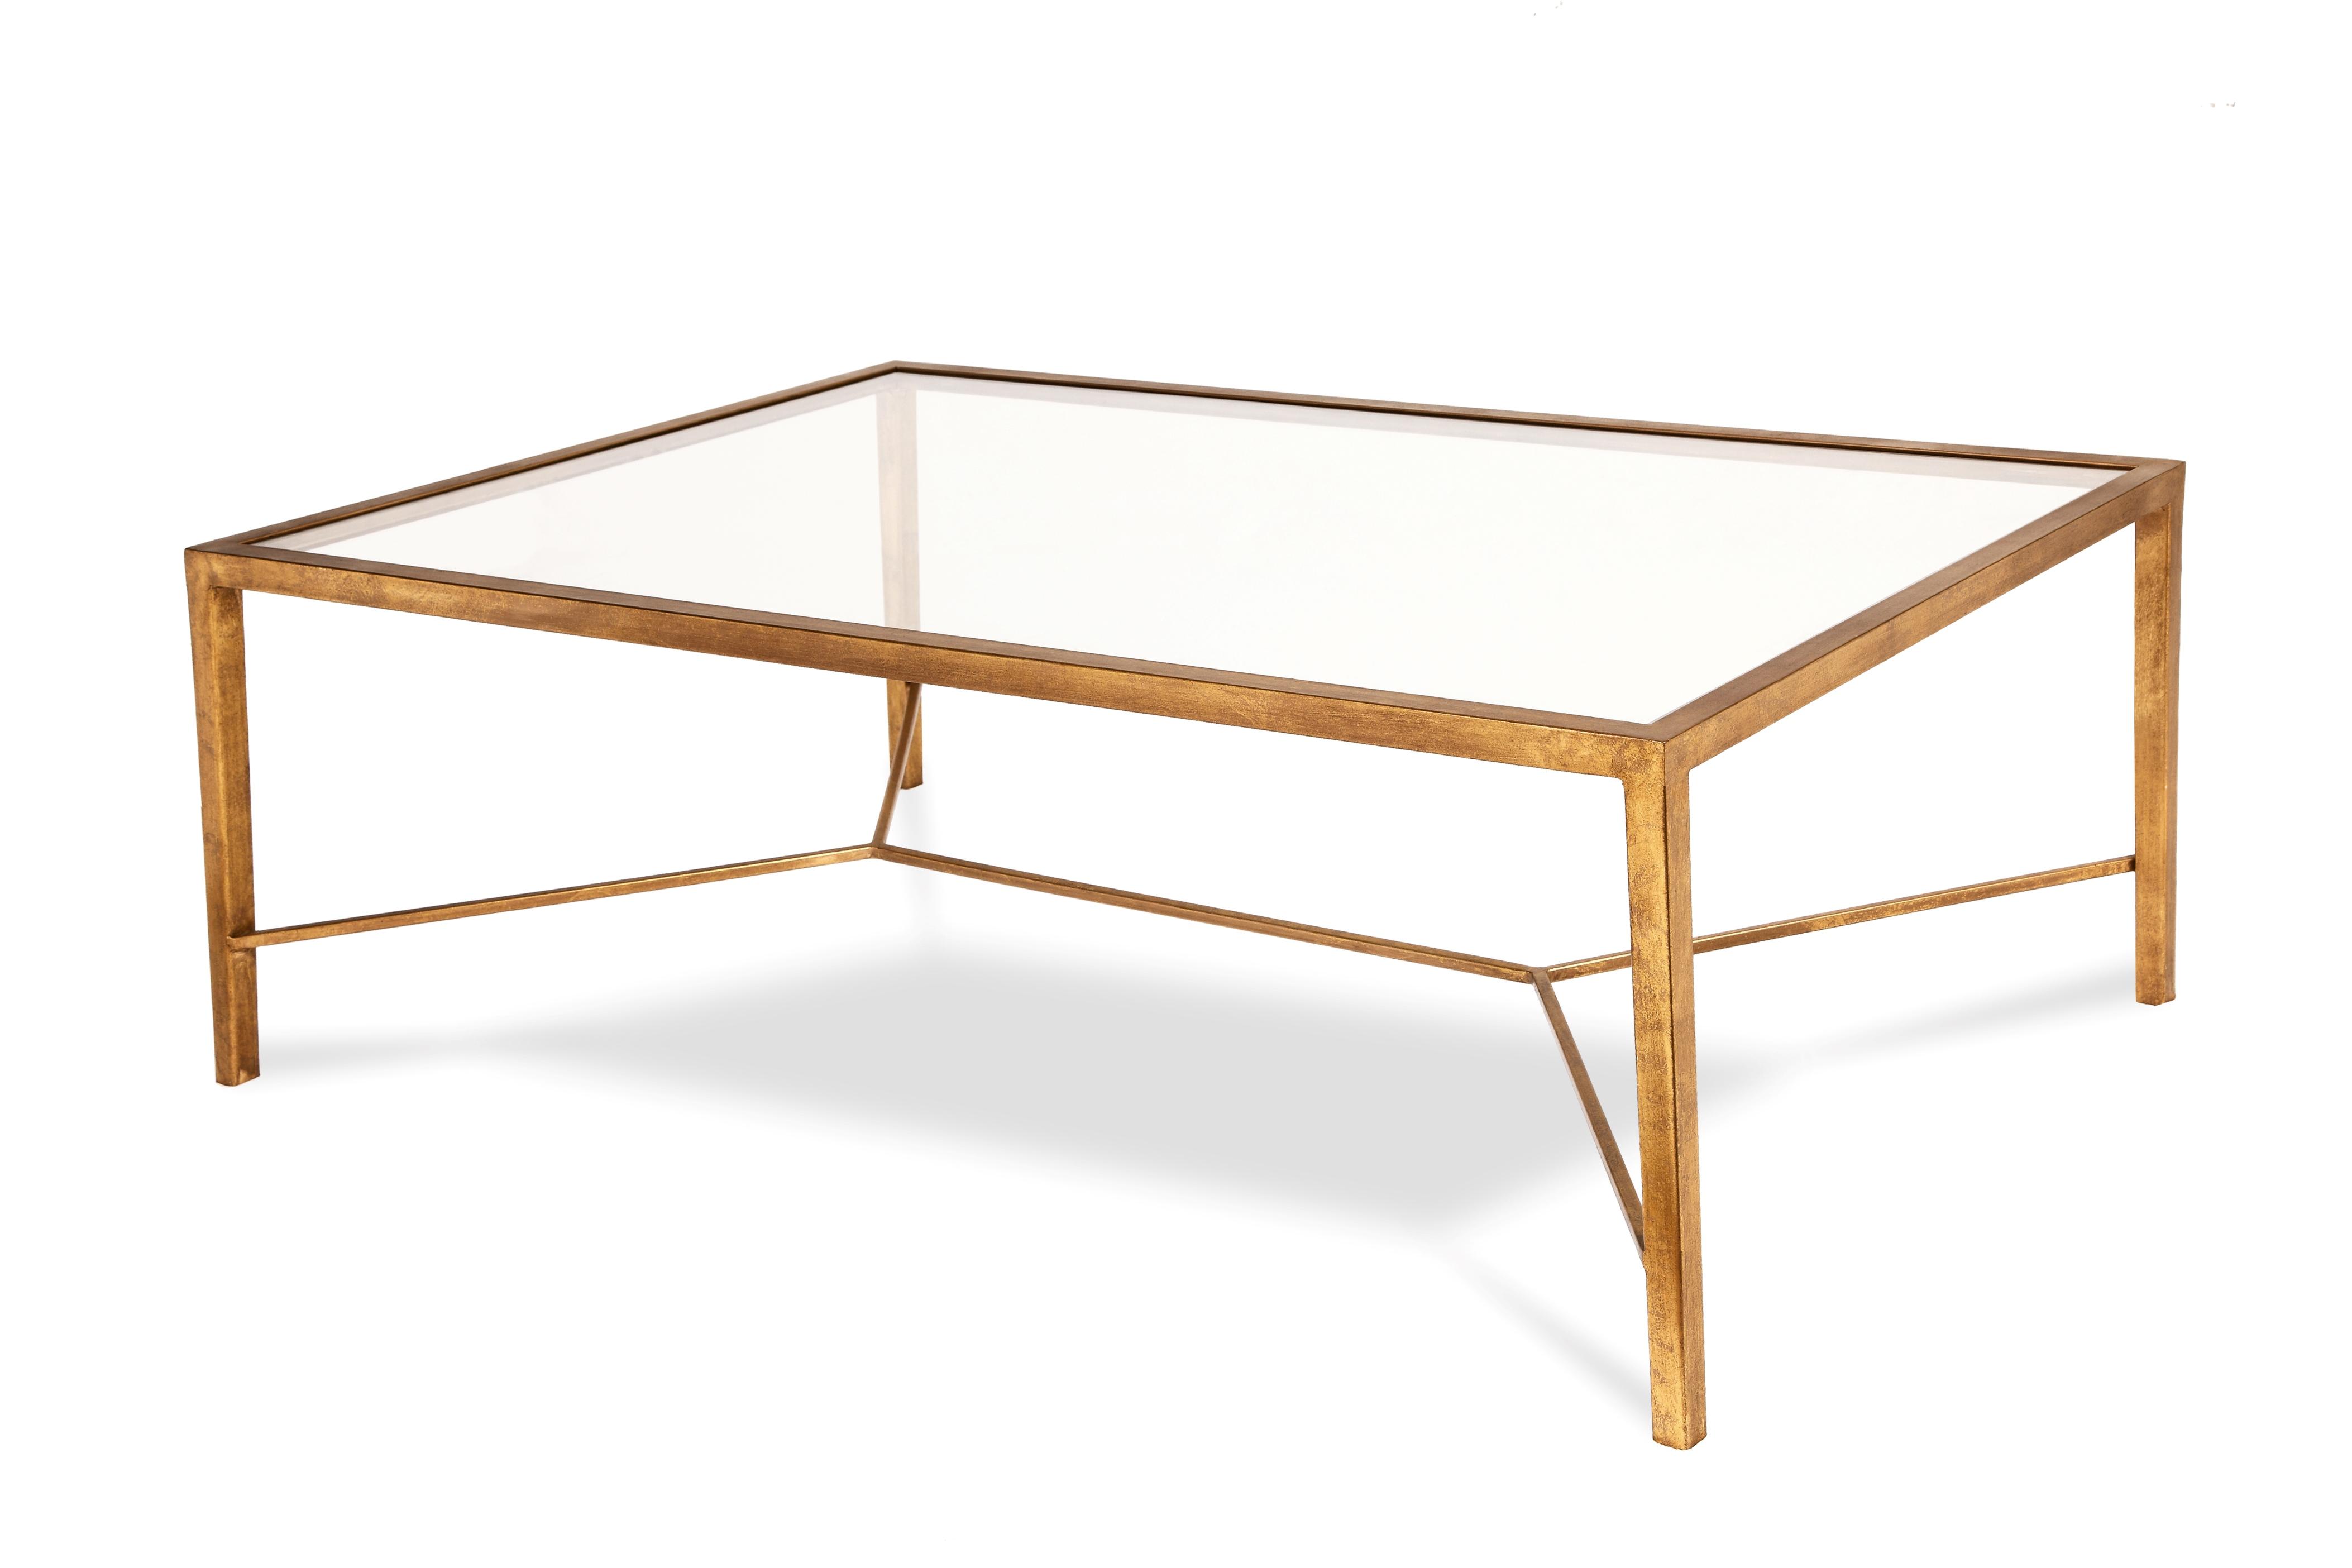 tarah coffee table : liang & eimil